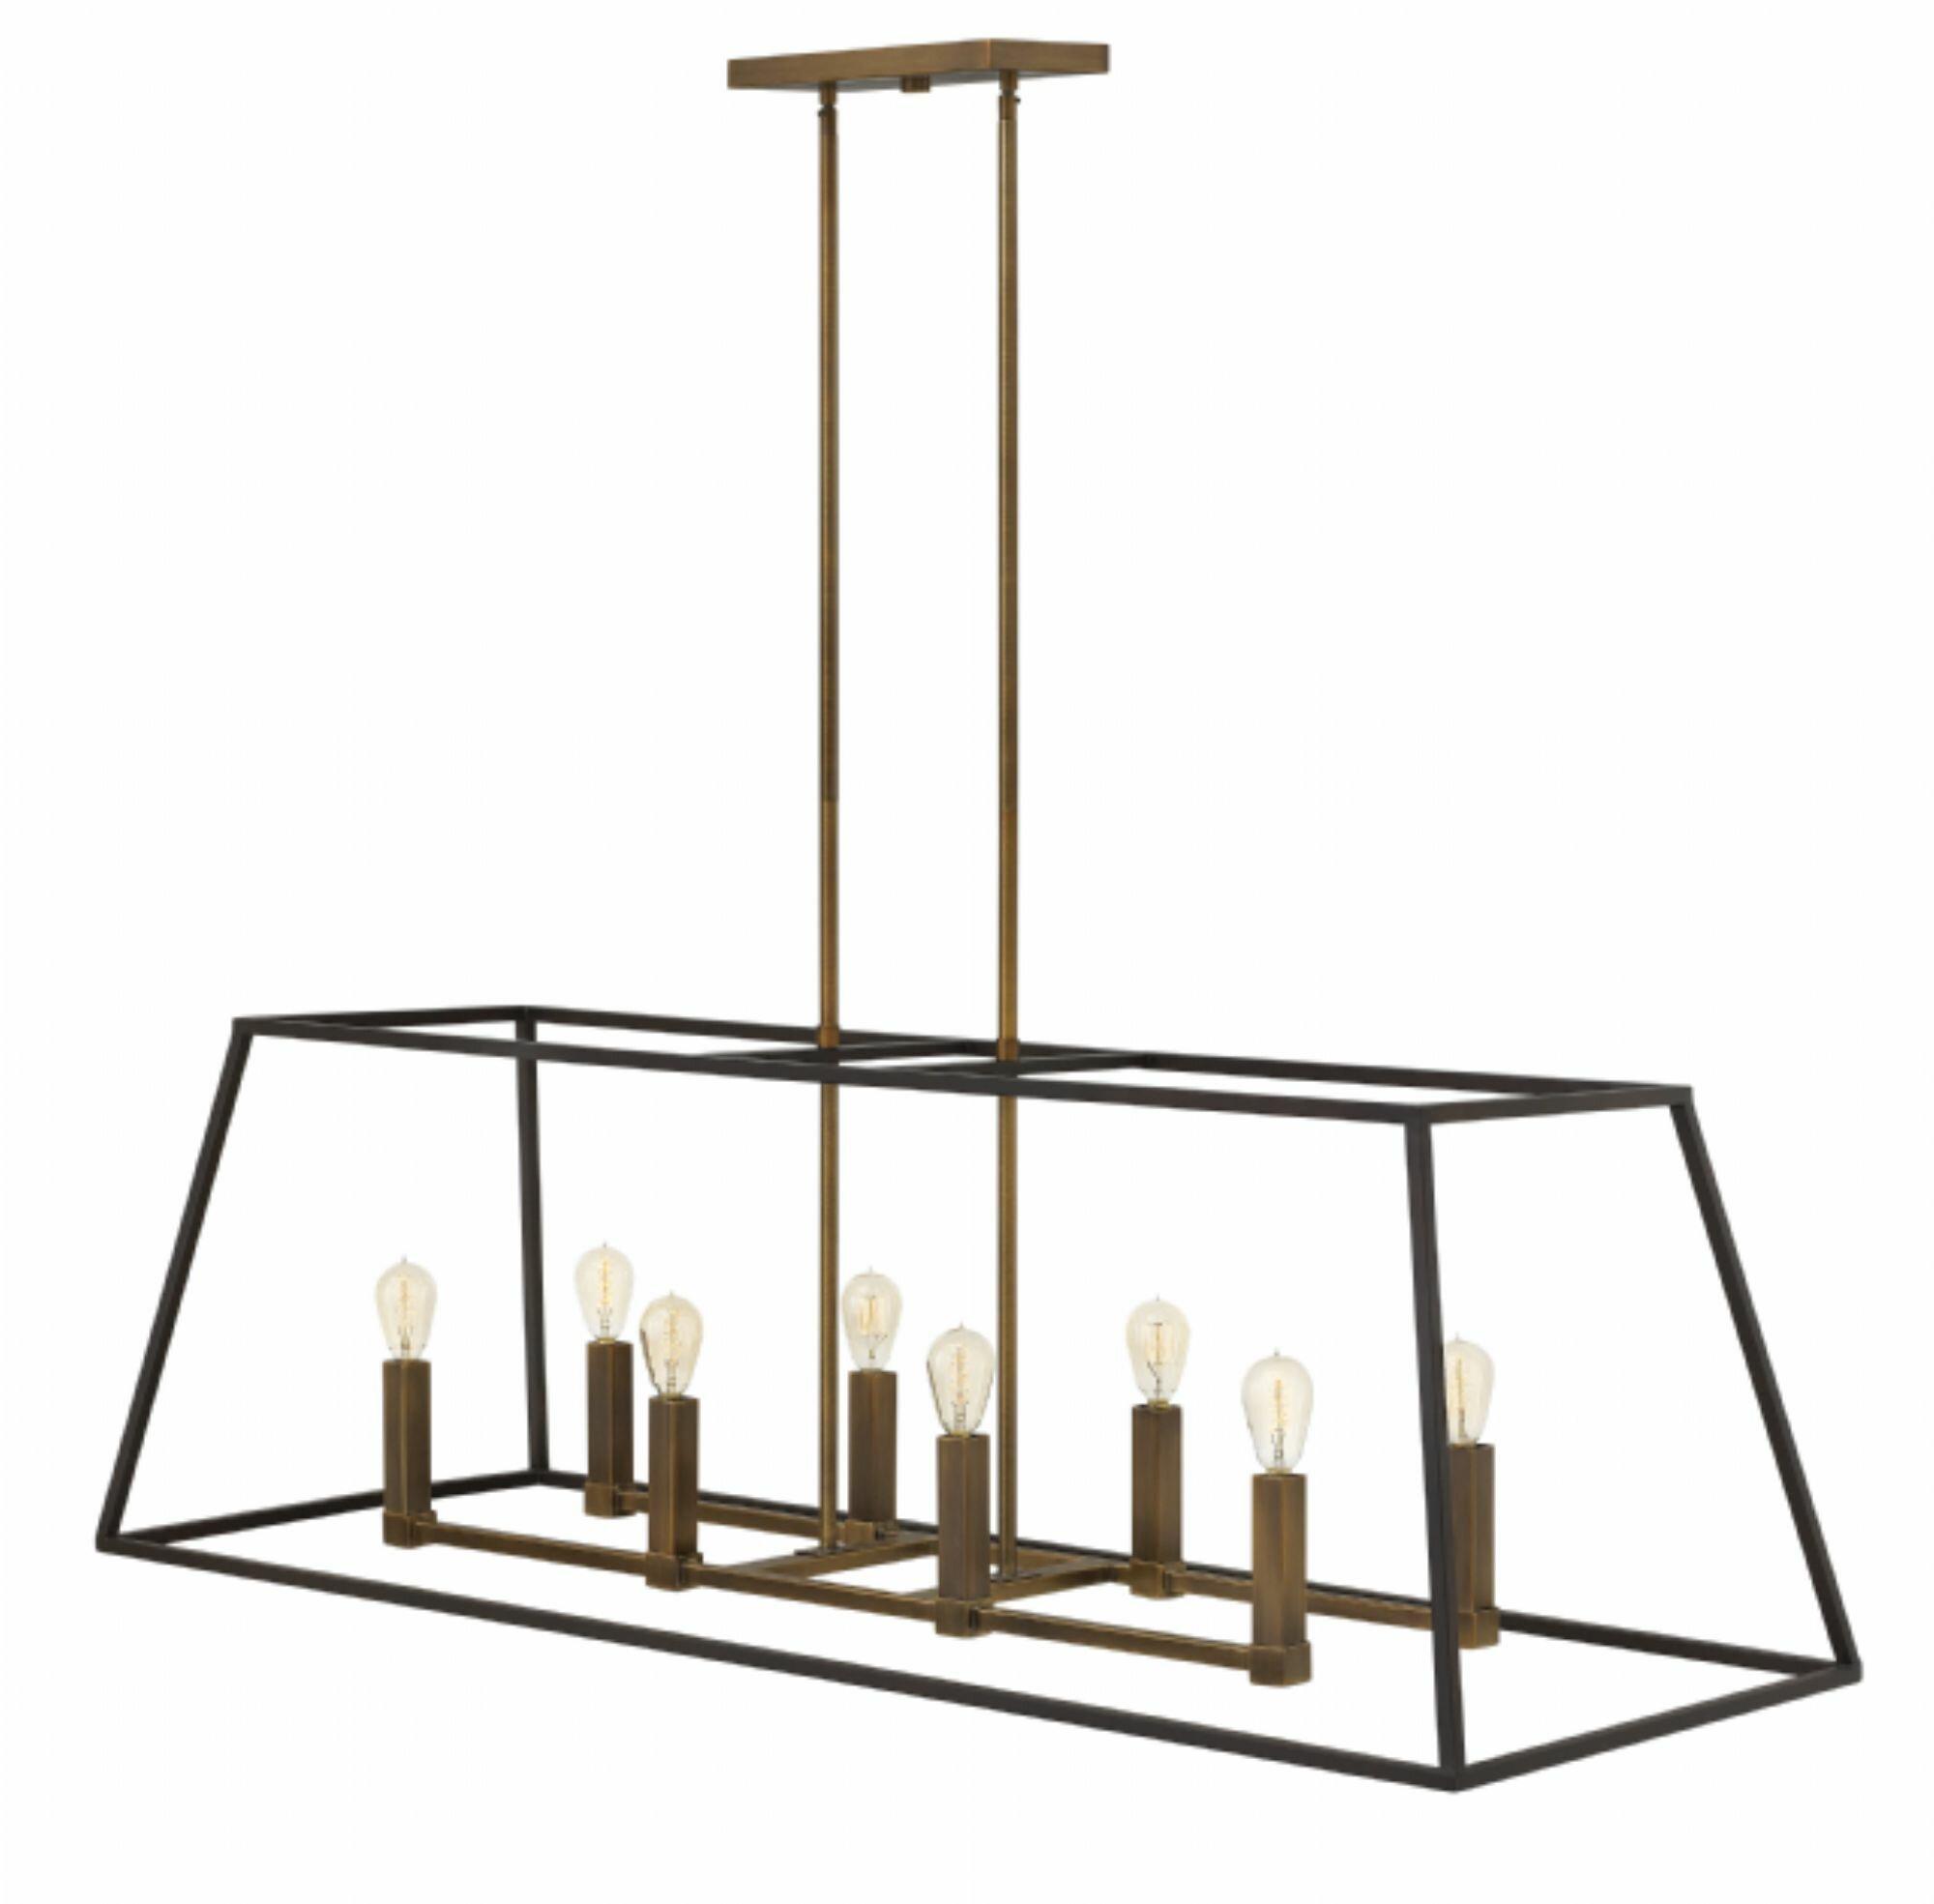 Hinkley lighting fulton 8 light pendant reviews wayfair arubaitofo Gallery